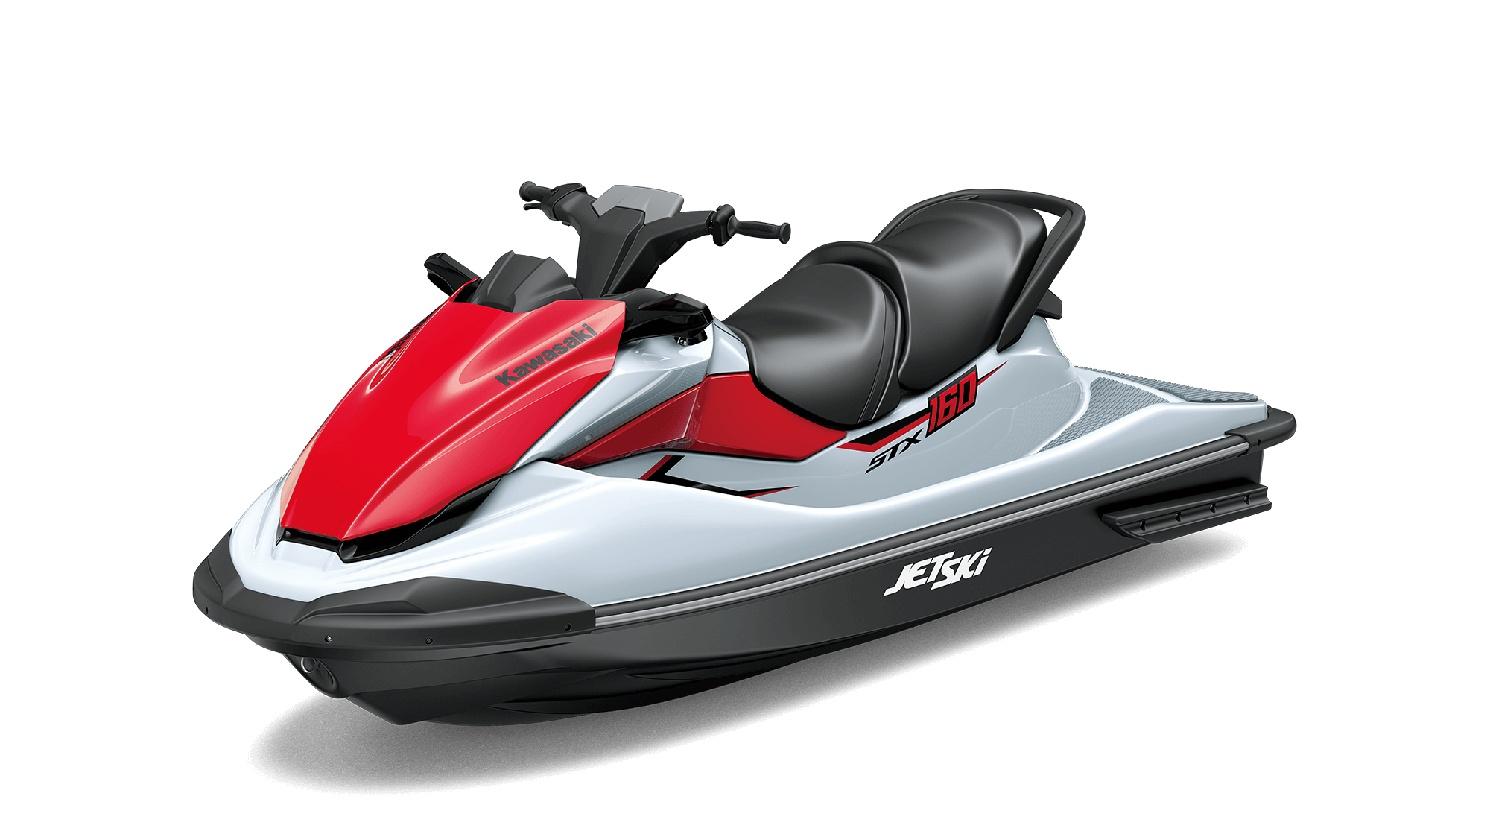 2021 Kawasaki JET SKI STX 160 Crystal White / Sunbeam Red